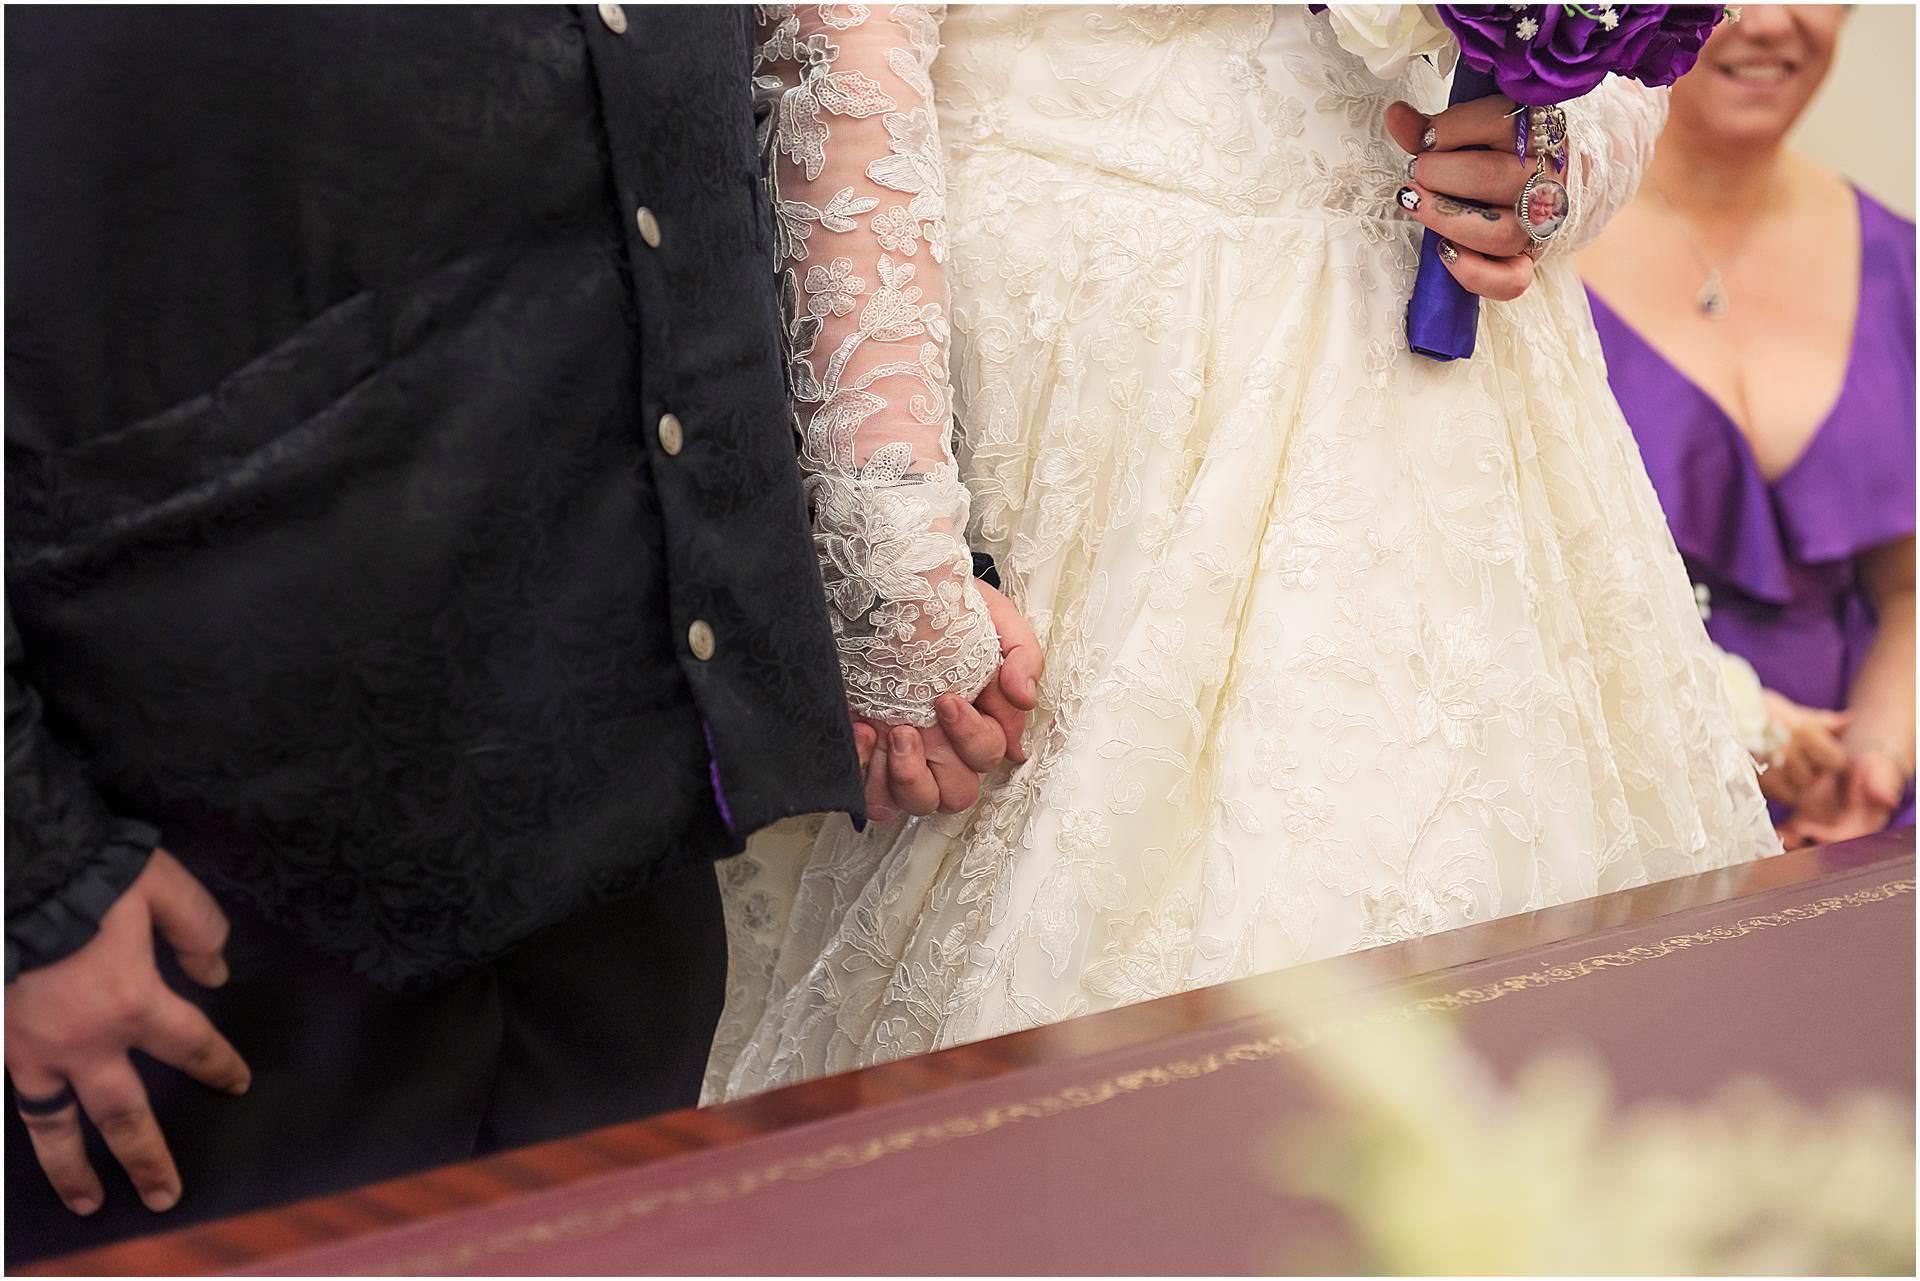 wedding_photography at dukinfield_townhall with sarah_bee_photography dukinfield_park dukinfeild_cheshire_2002.jpg